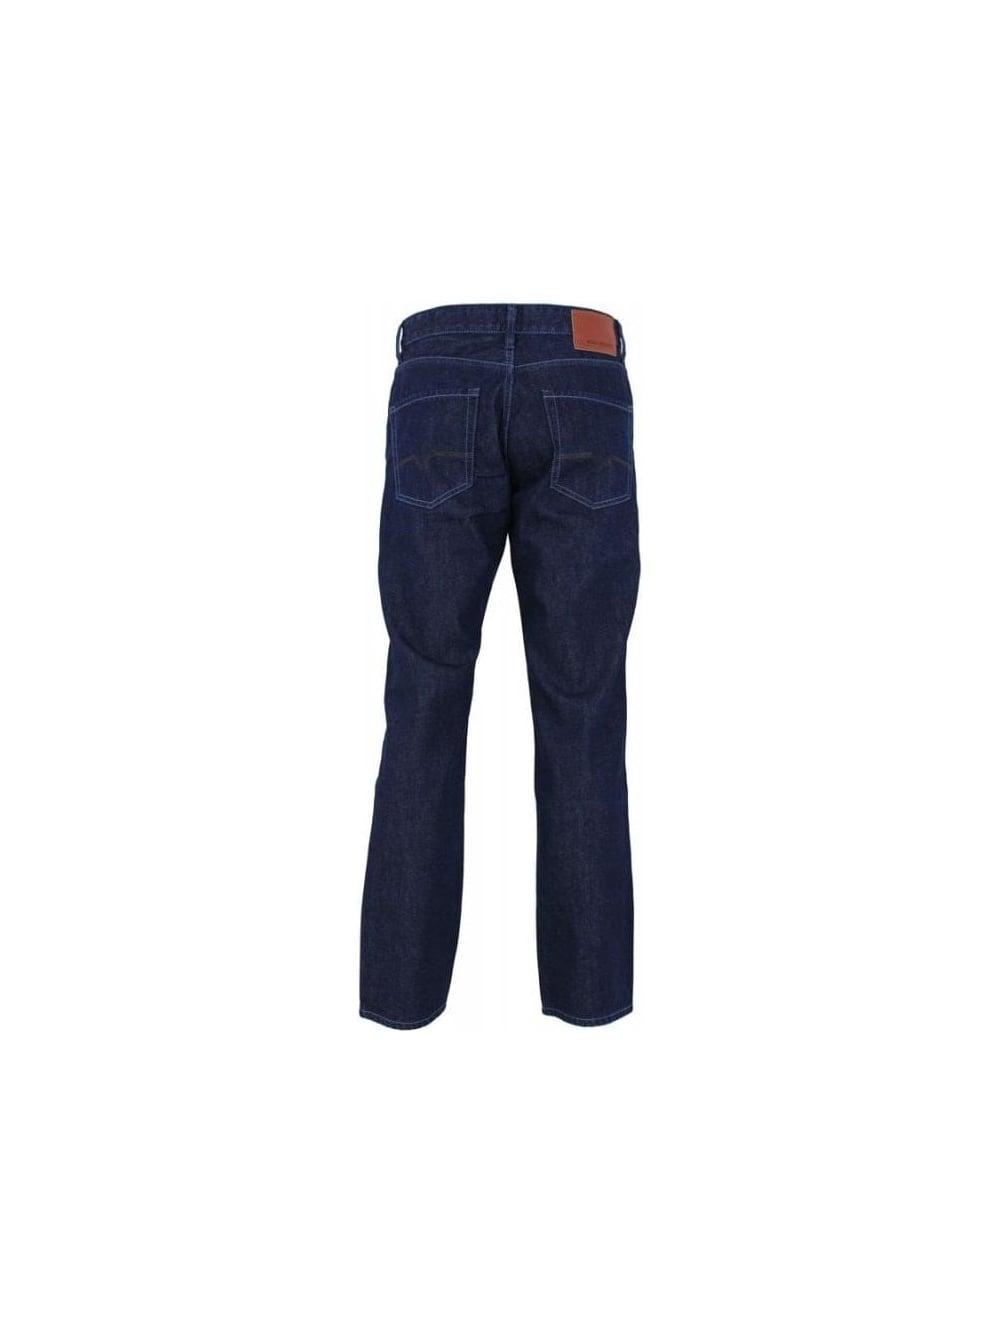 hugo boss orange 25 jeans in dark blue northern threads. Black Bedroom Furniture Sets. Home Design Ideas